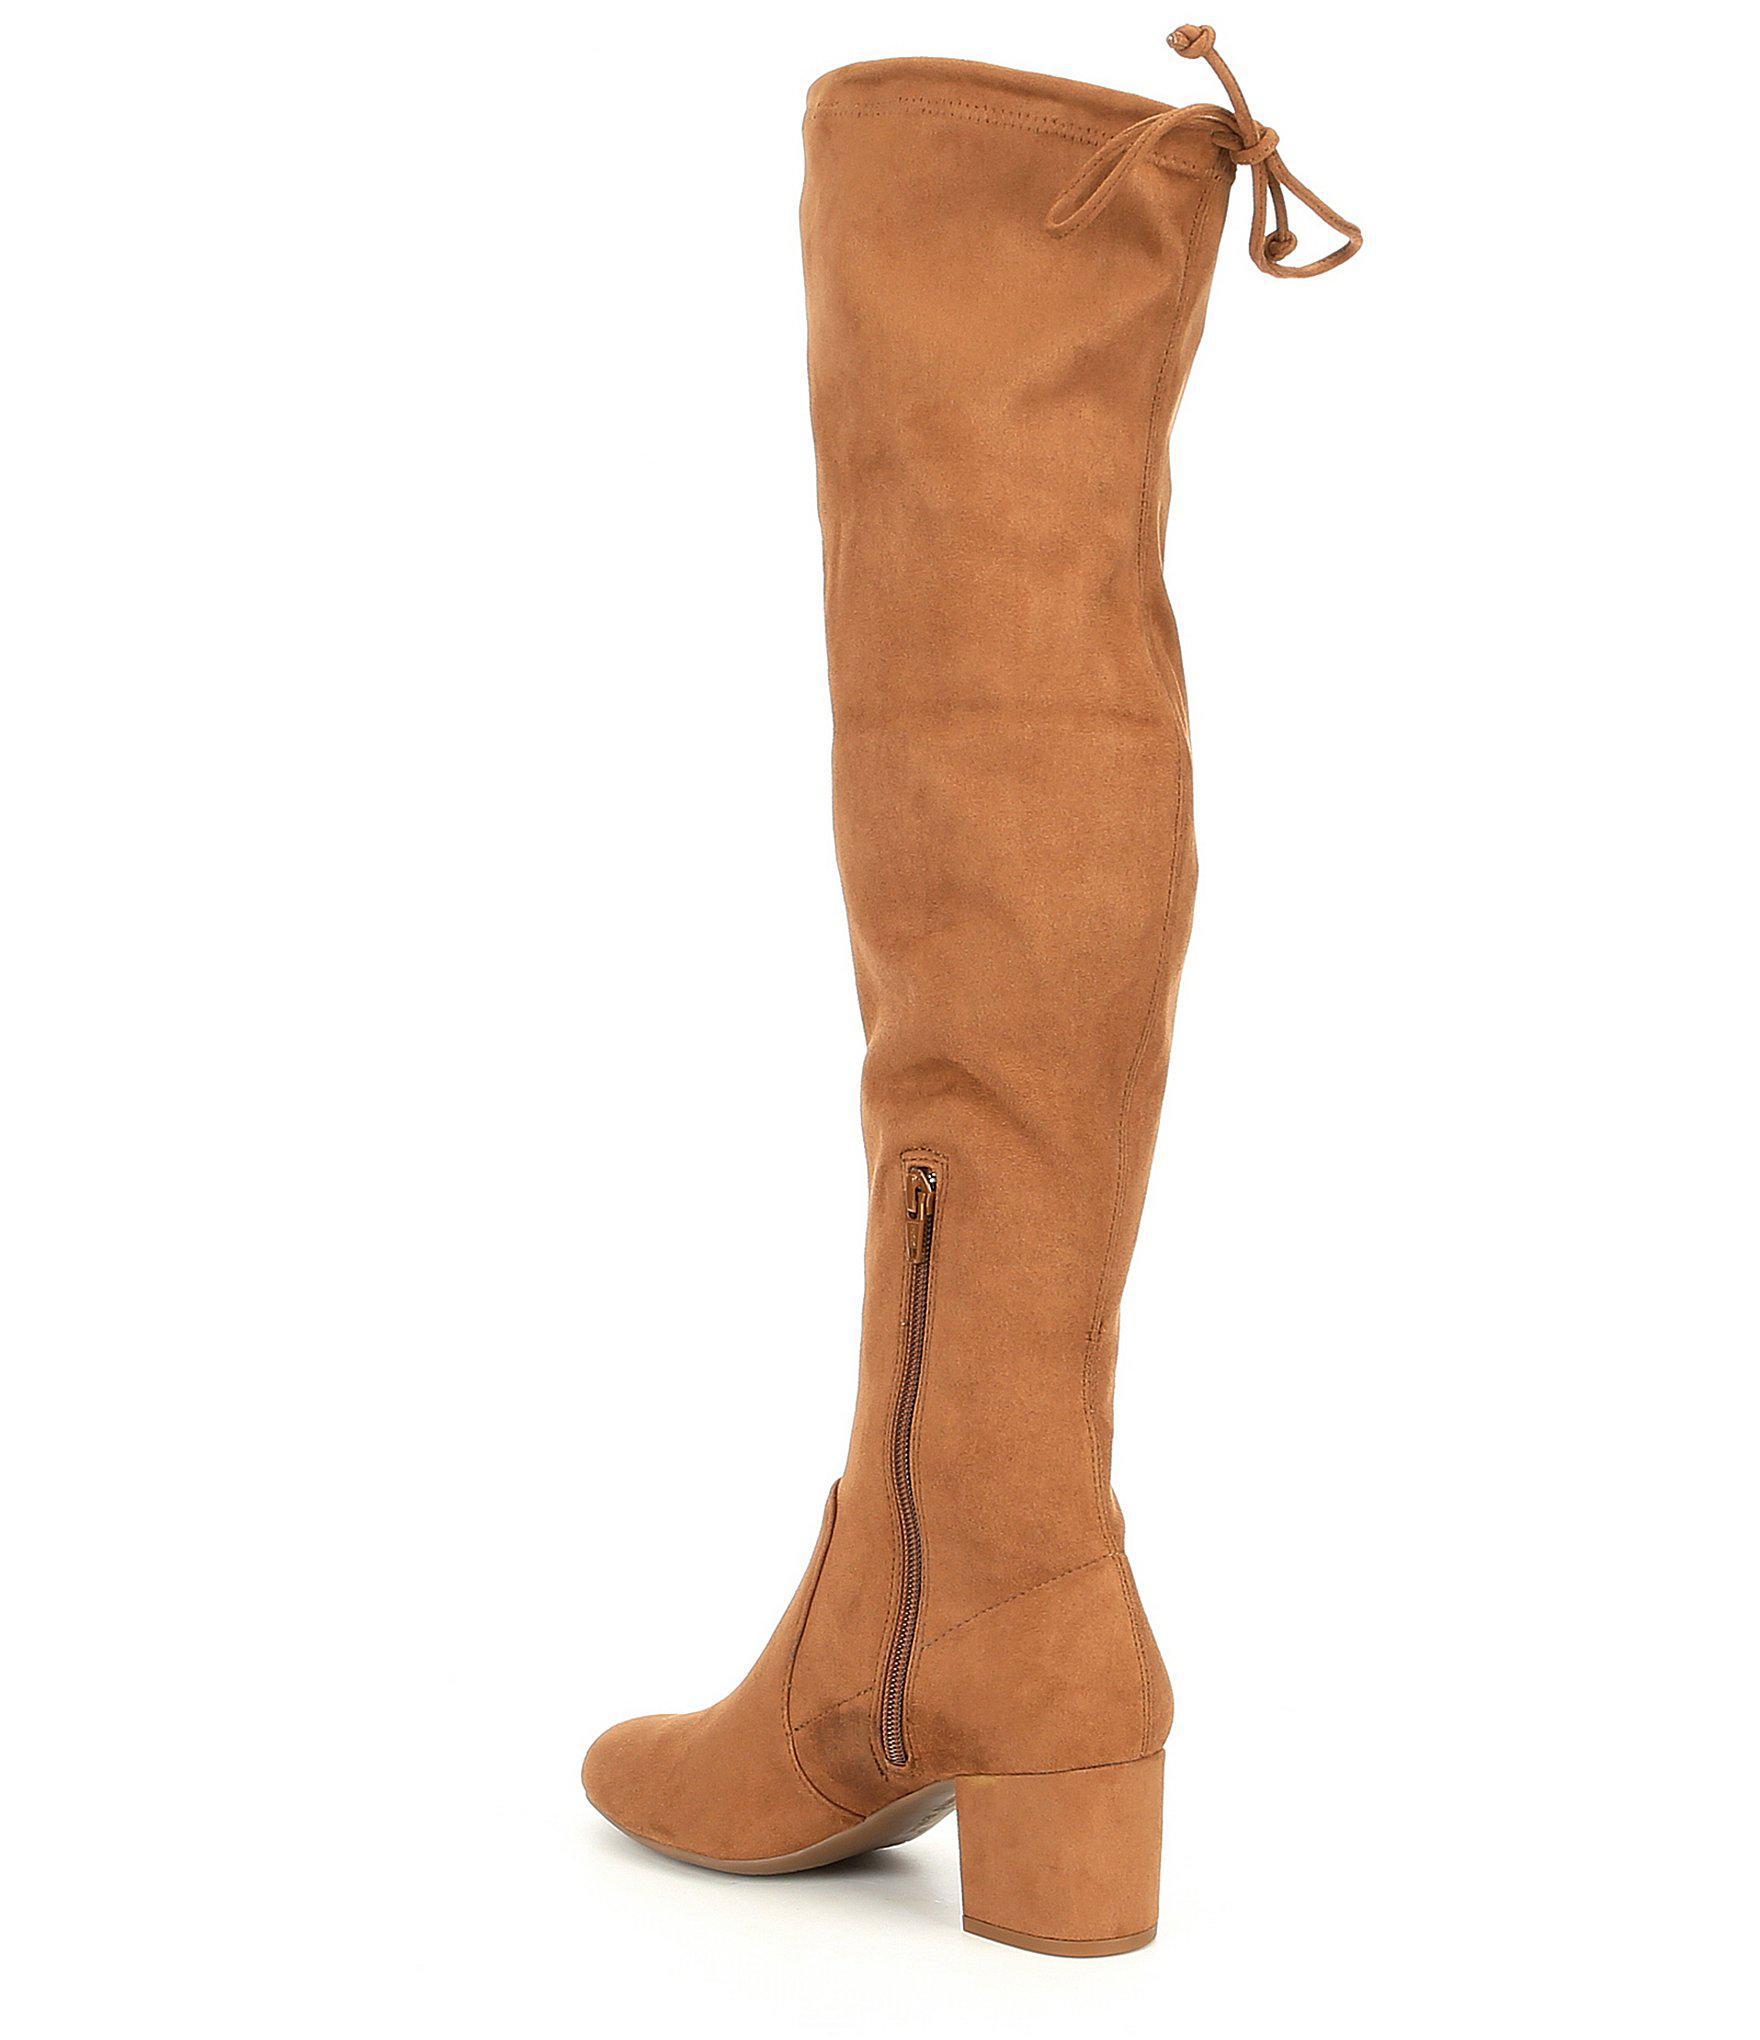 39151b1f6fa Lyst - Gianni Bini Trillia Block Heel Stretch Over The Knee Boots in ...